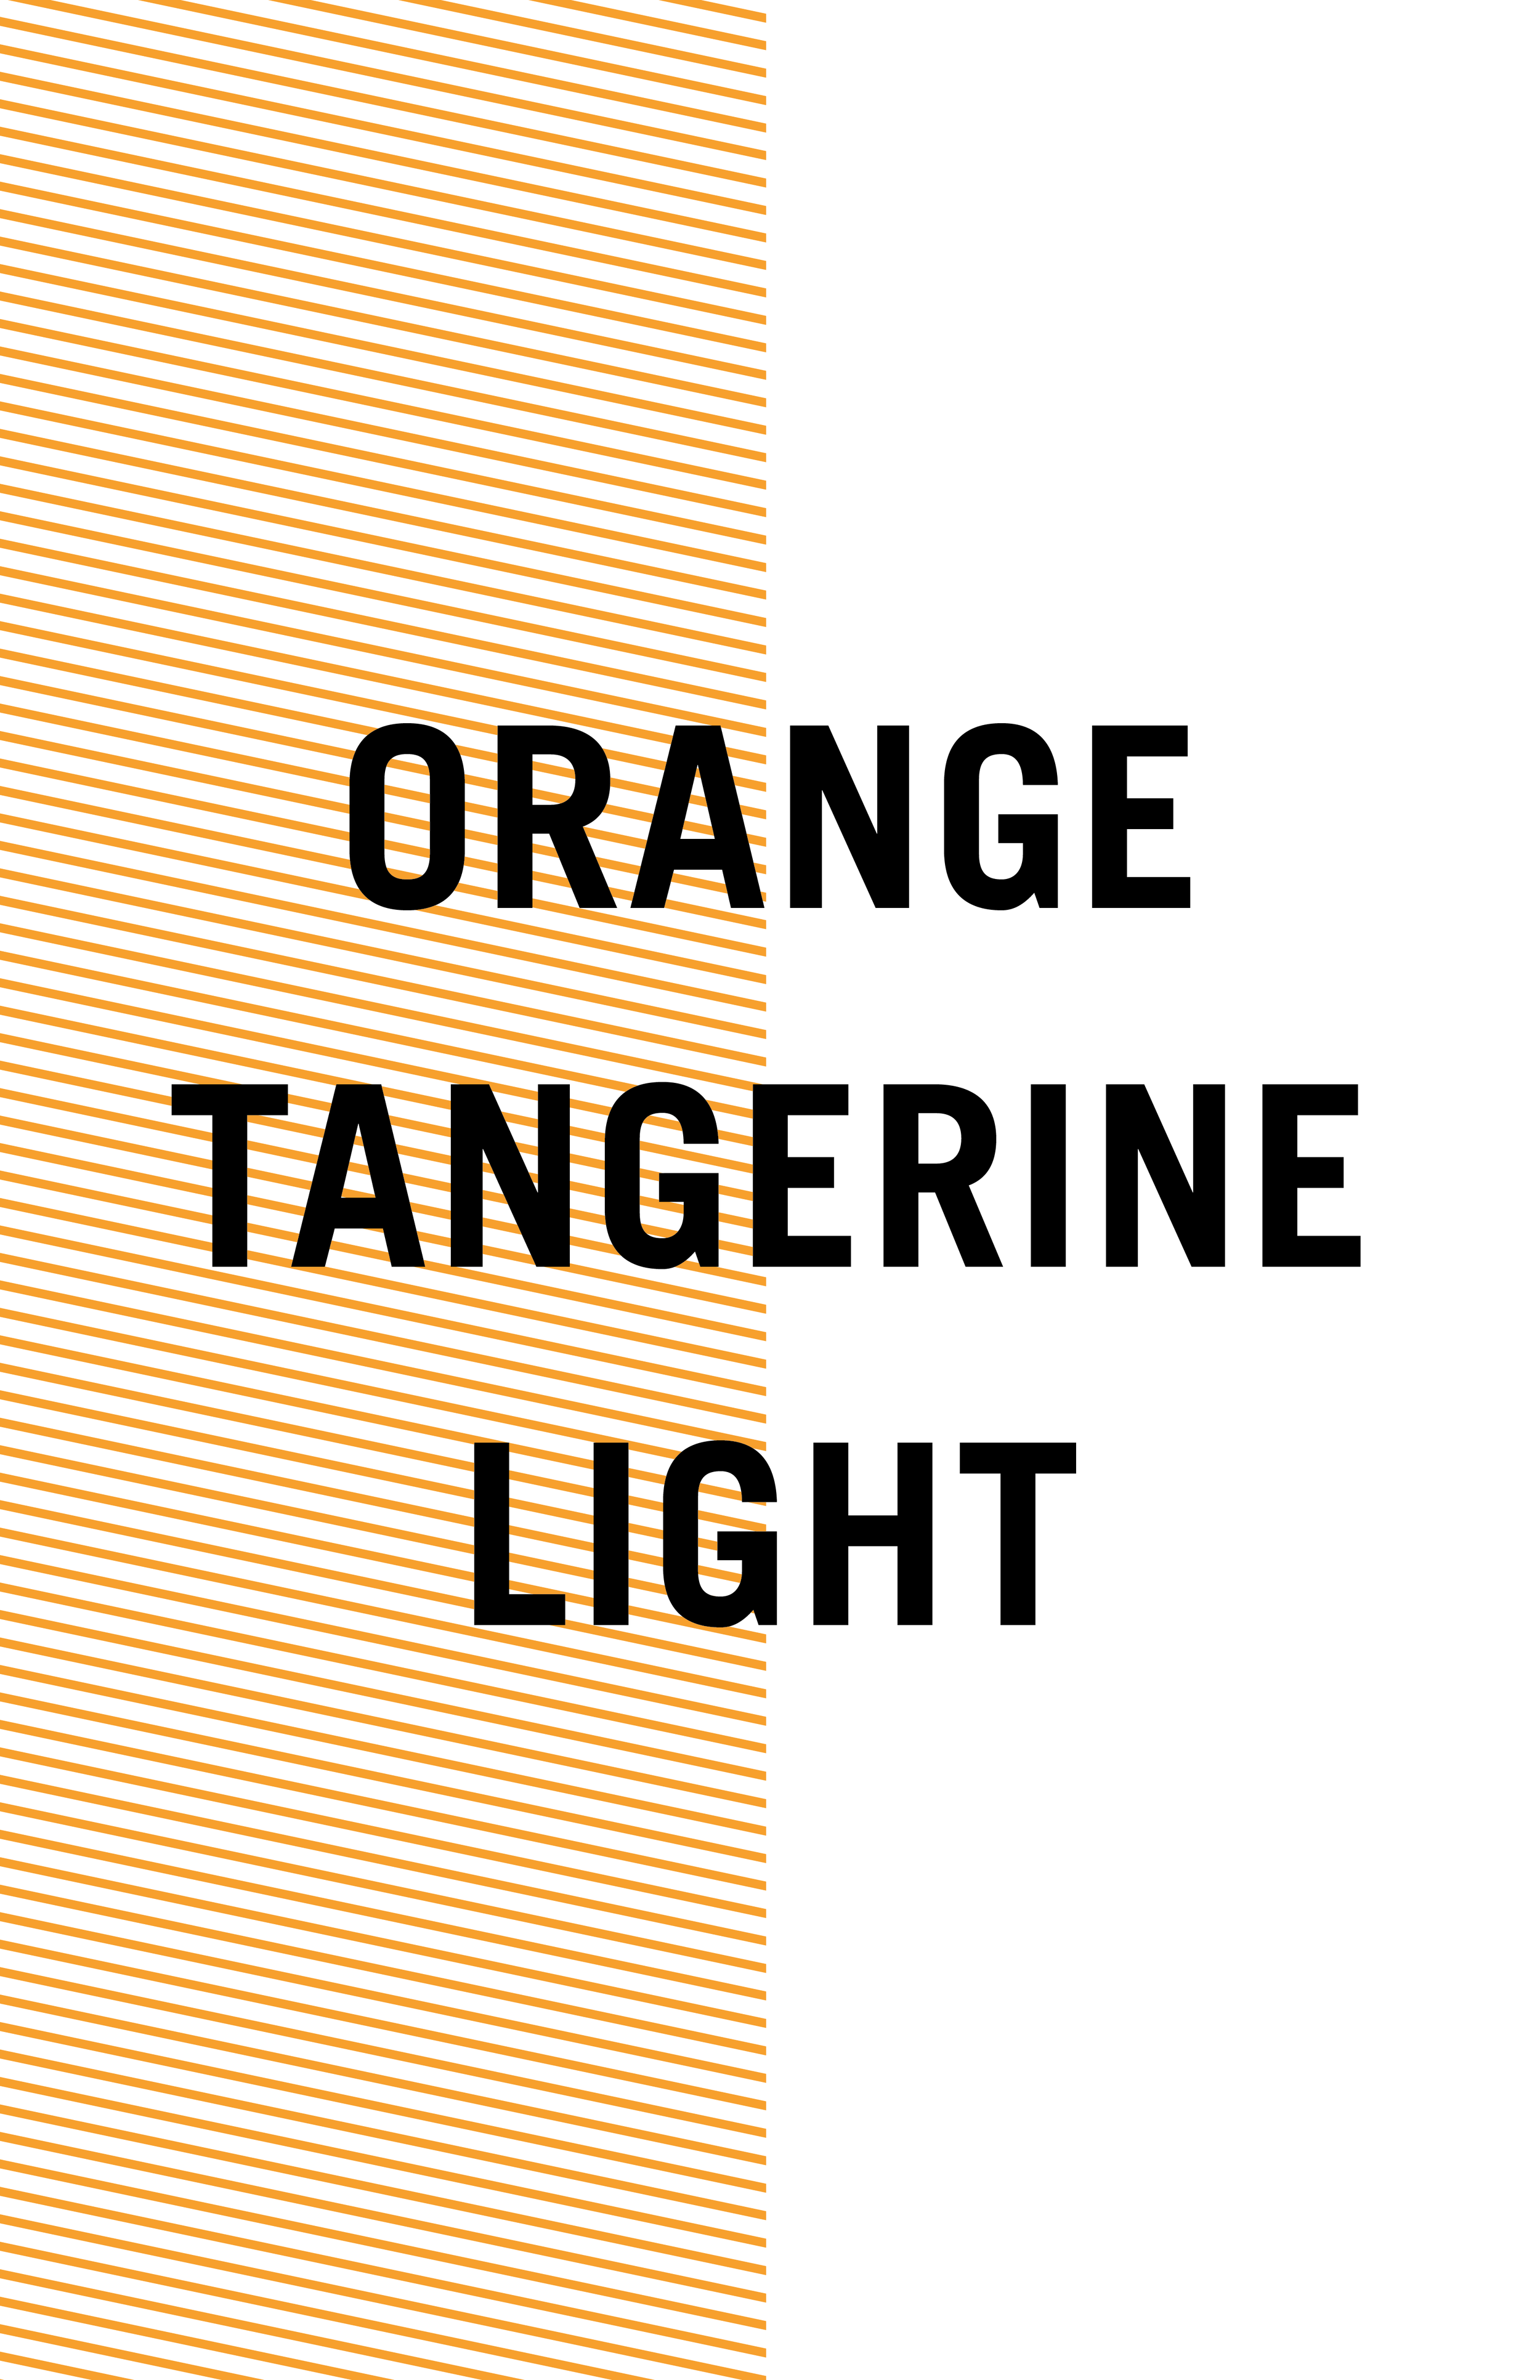 OrangeTangLight-03.png